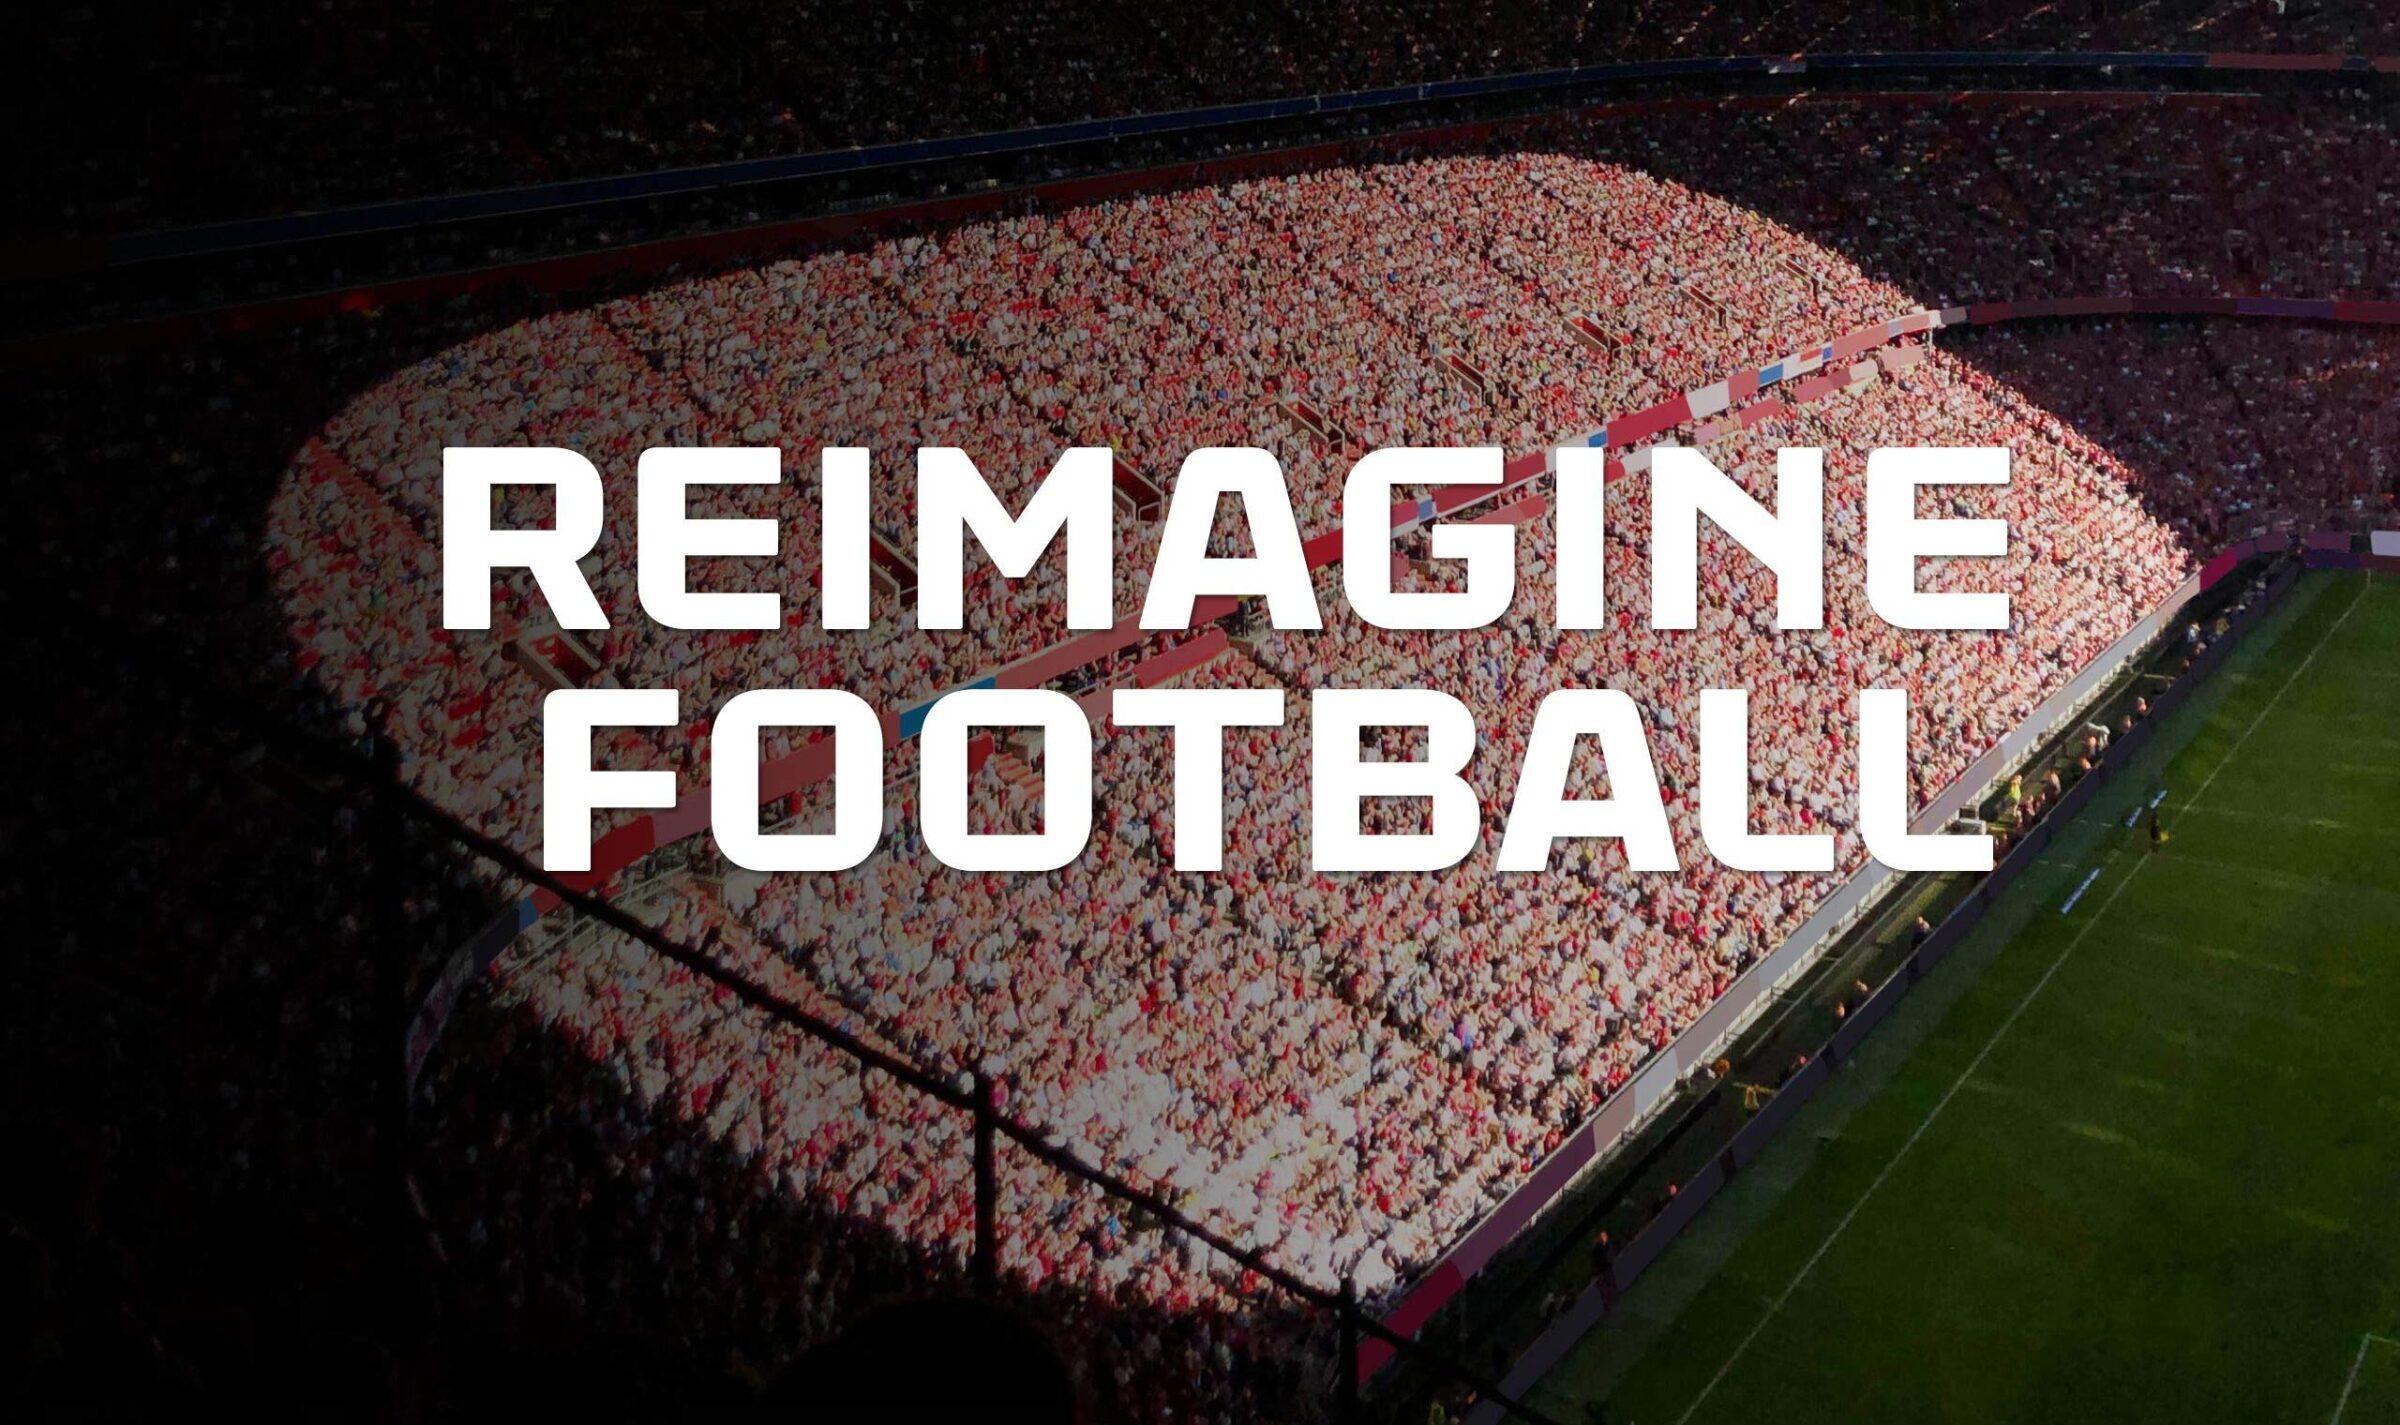 Reimagine football